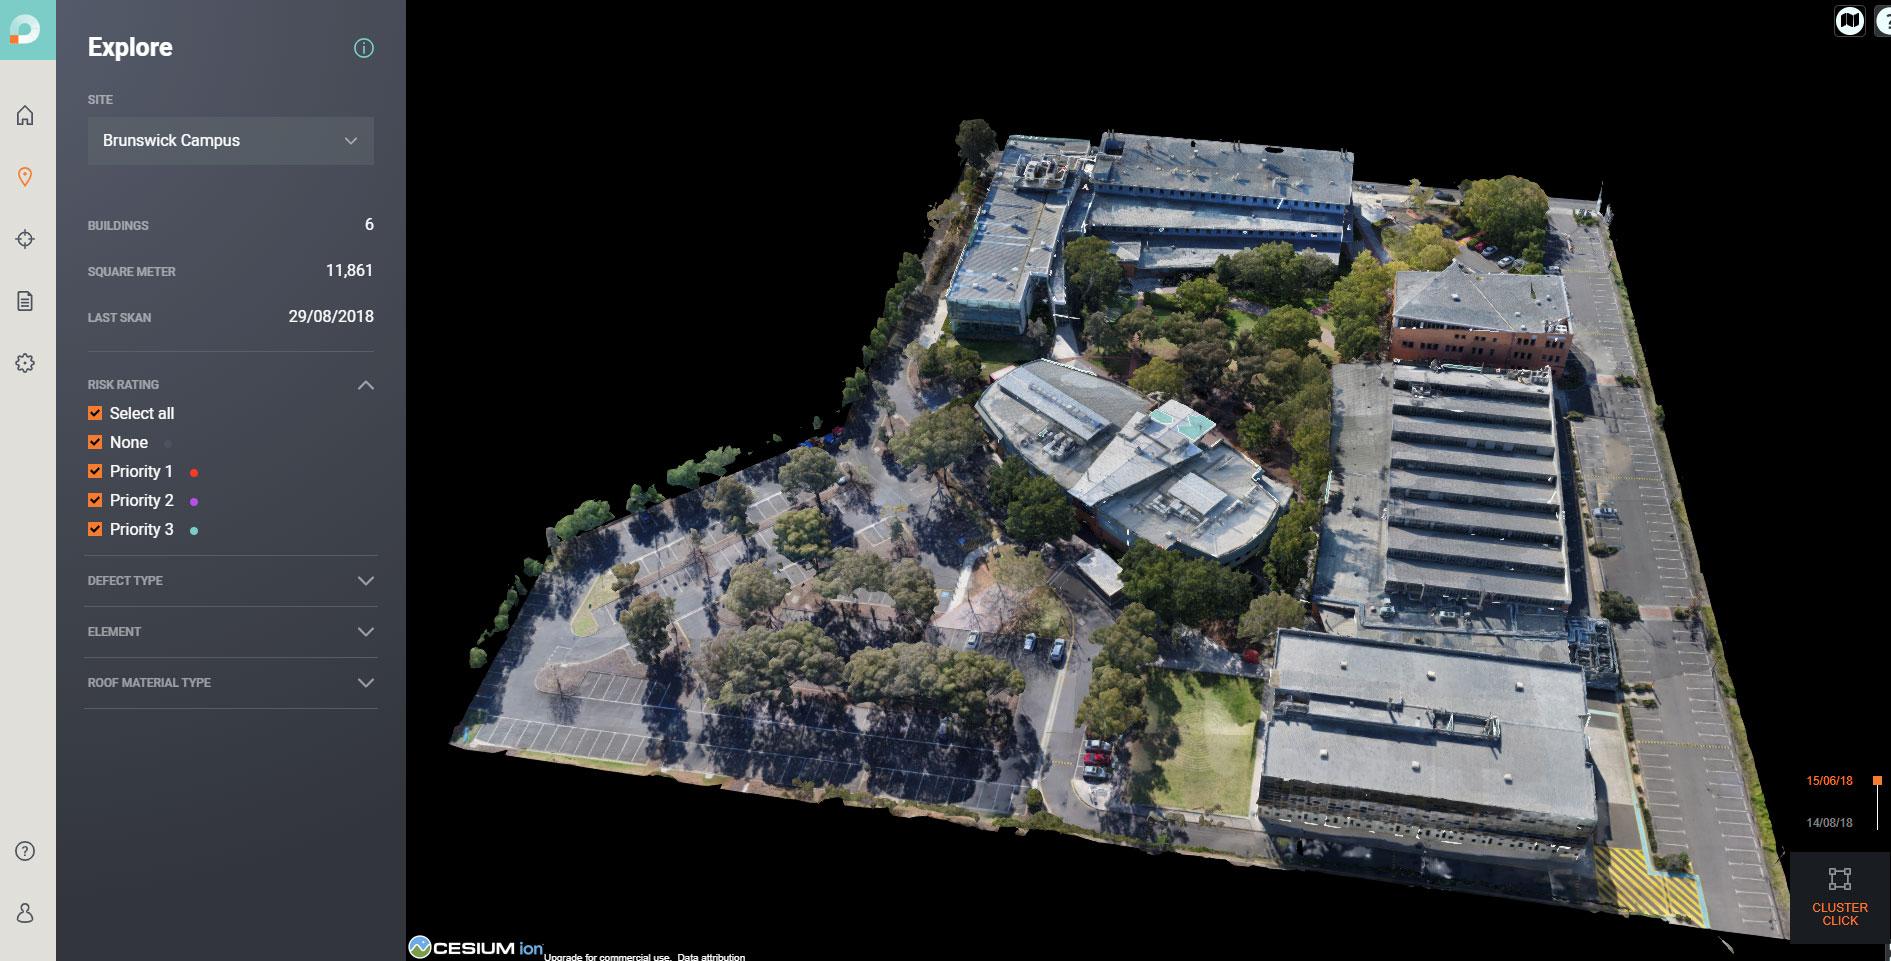 Assessing the RMIT Brunswick campus